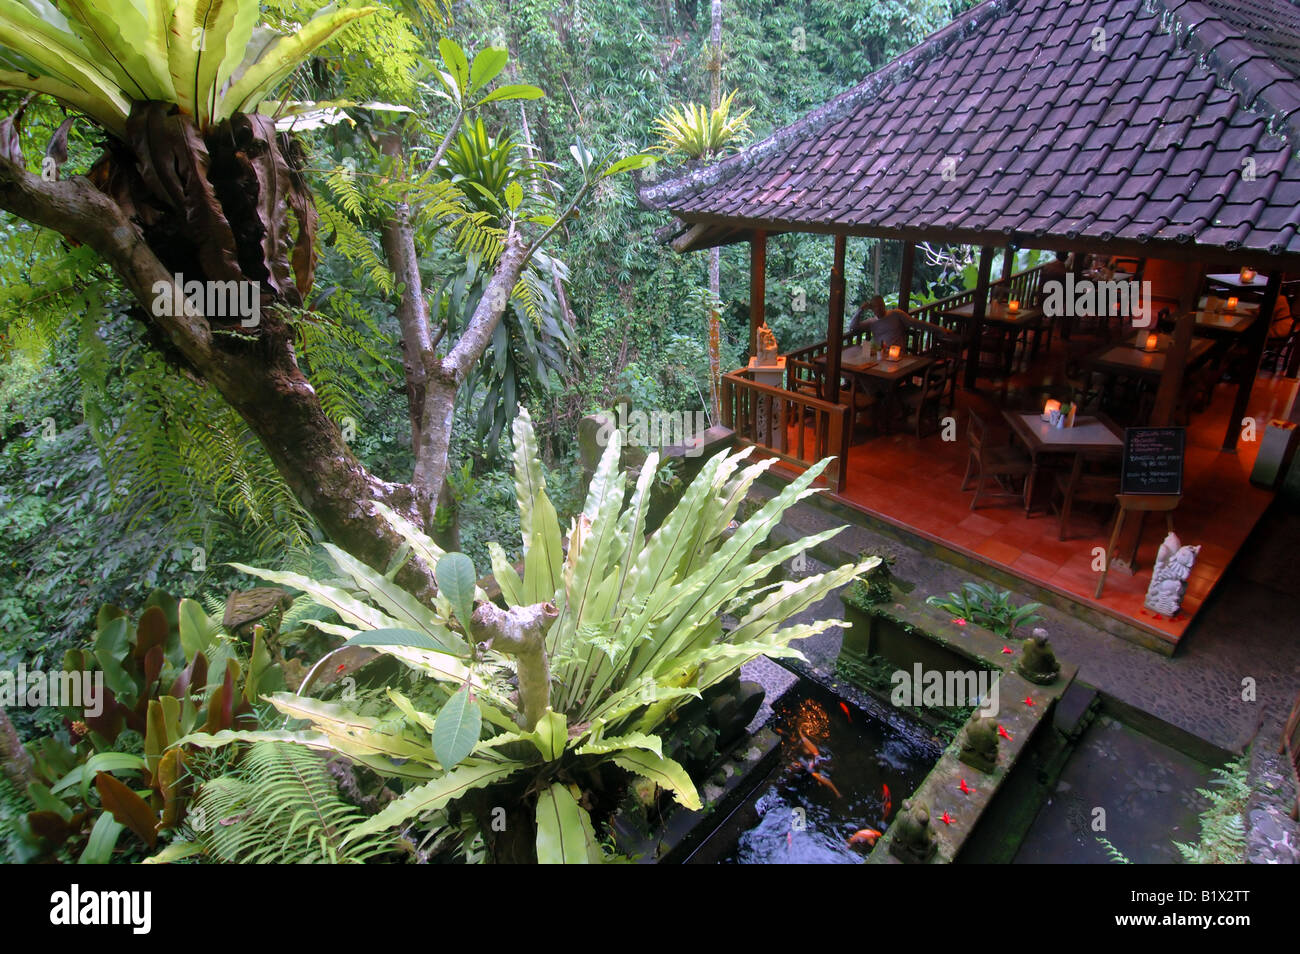 Lush Tropical Surrounds Of Murni S Warung Restaurant In Ubud Bali Stock Photo Alamy